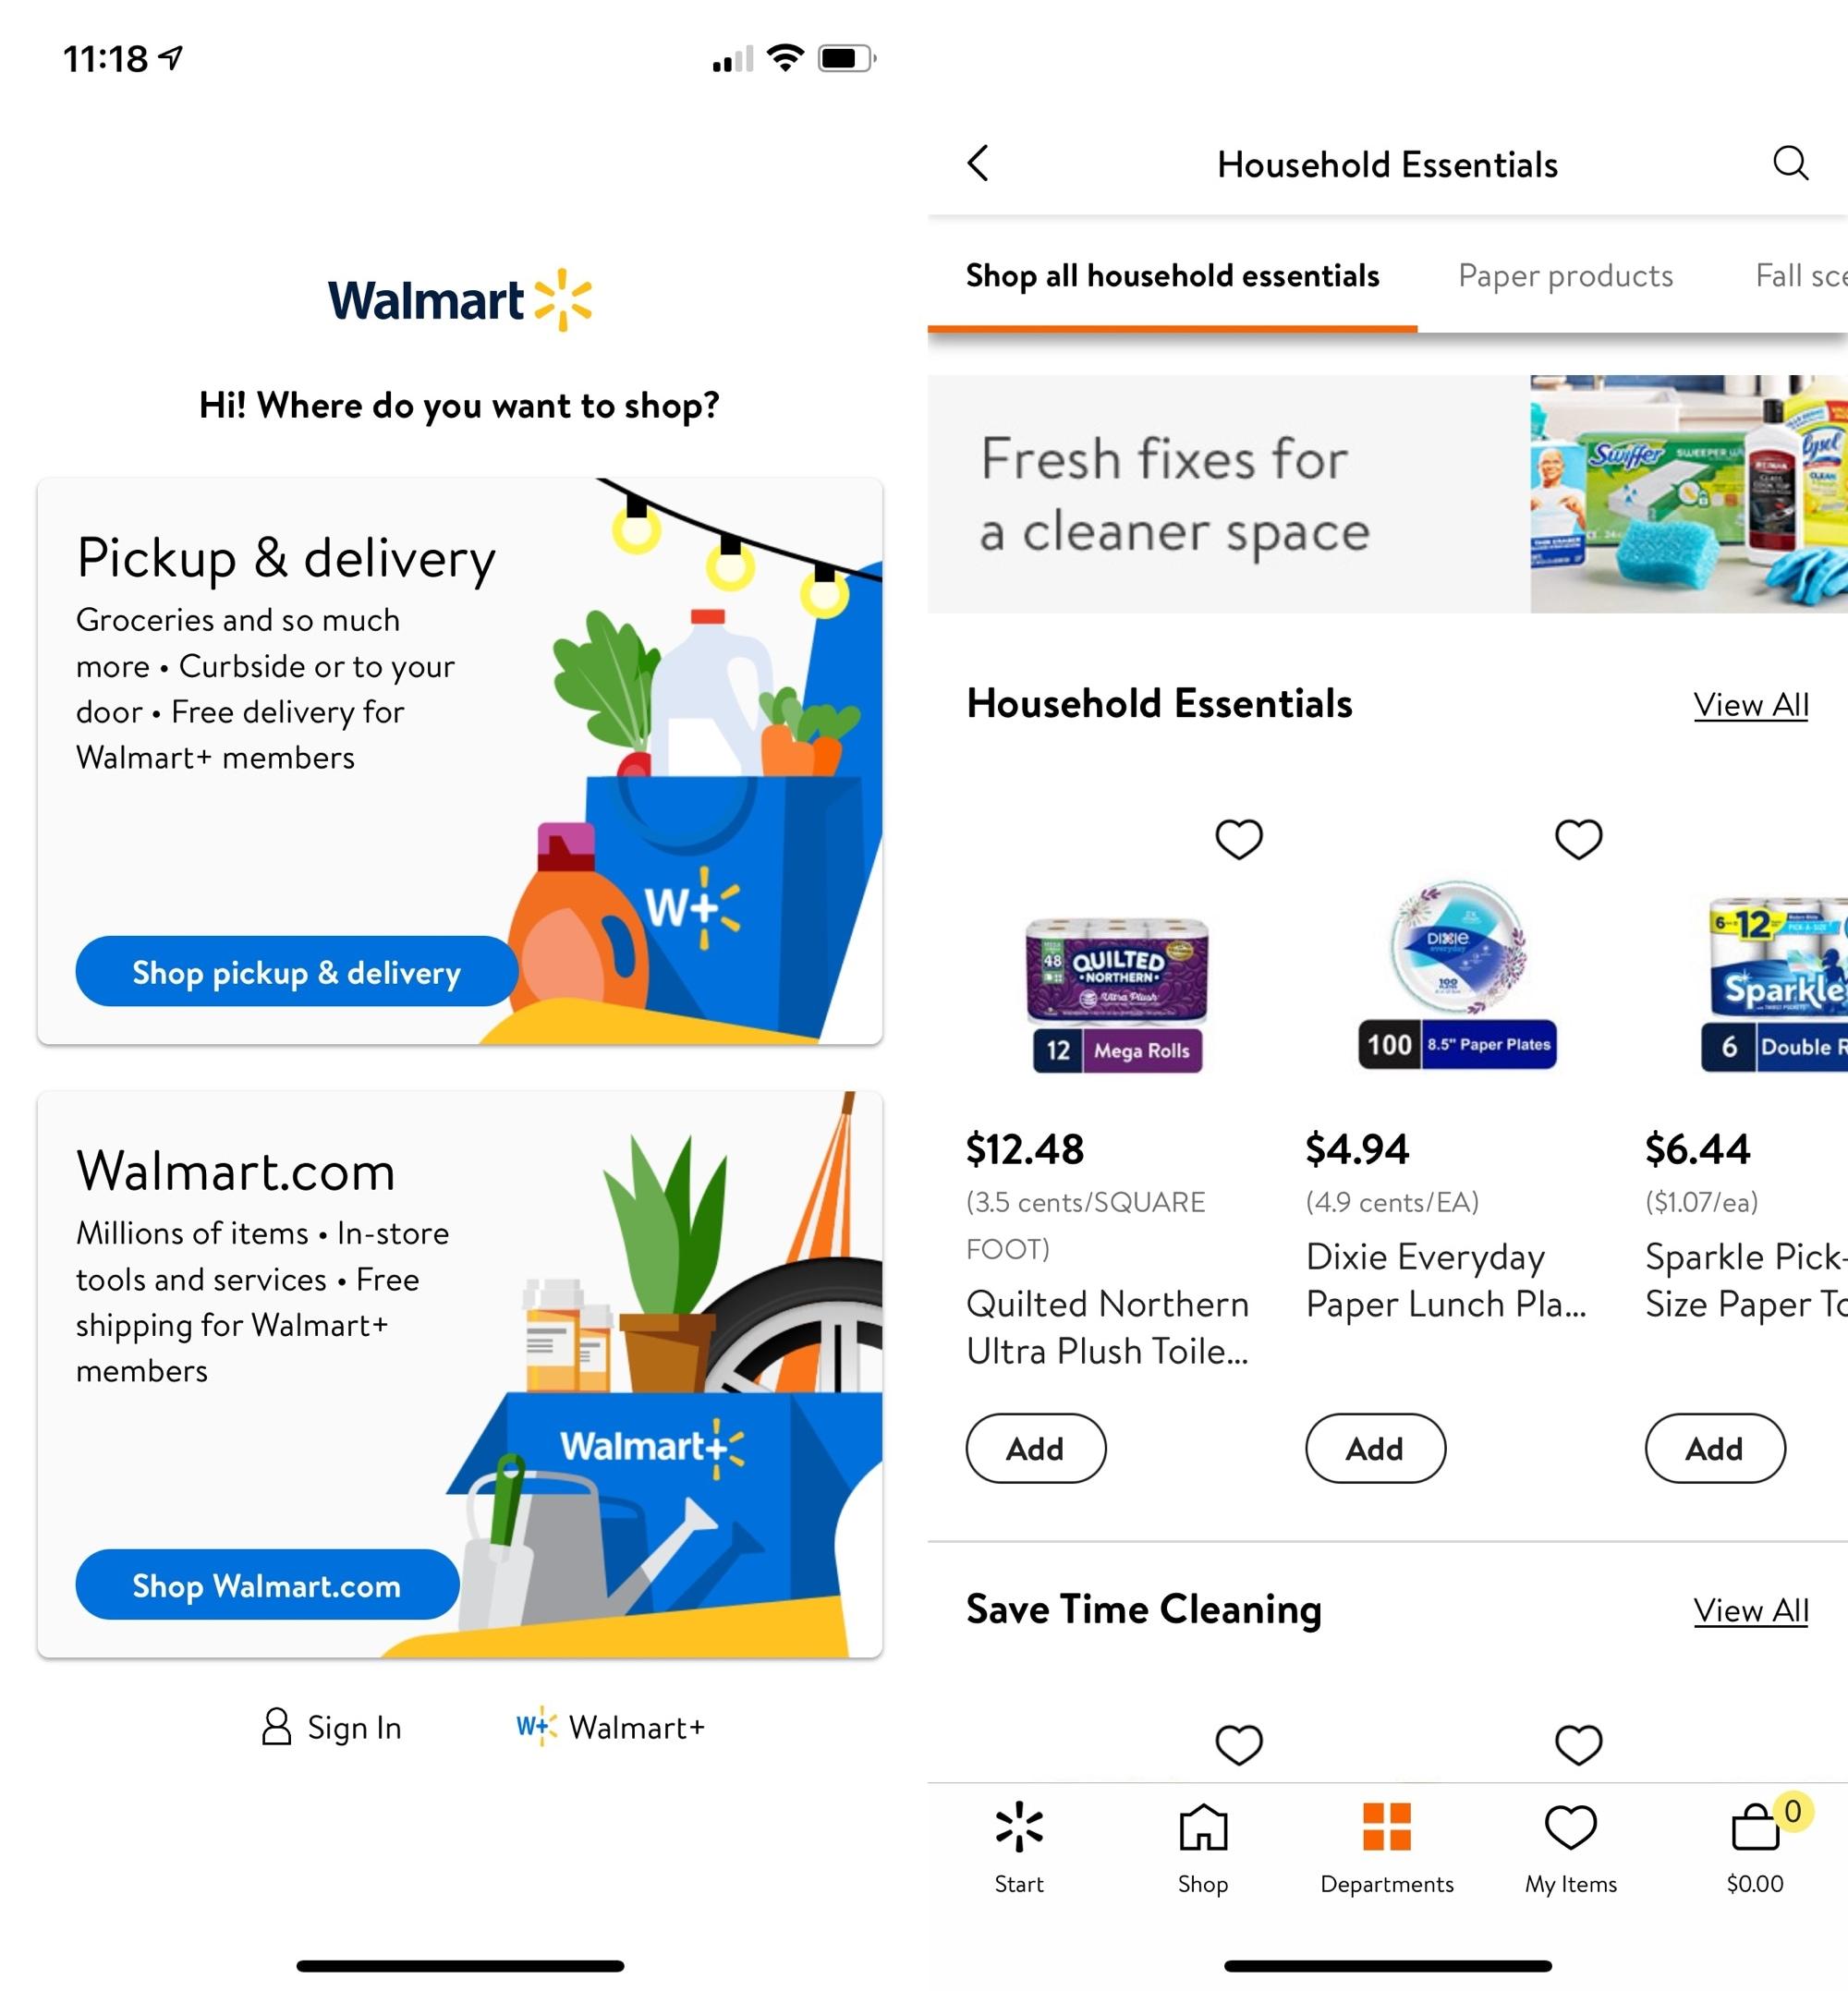 Walmart Household Supplies on iPhone